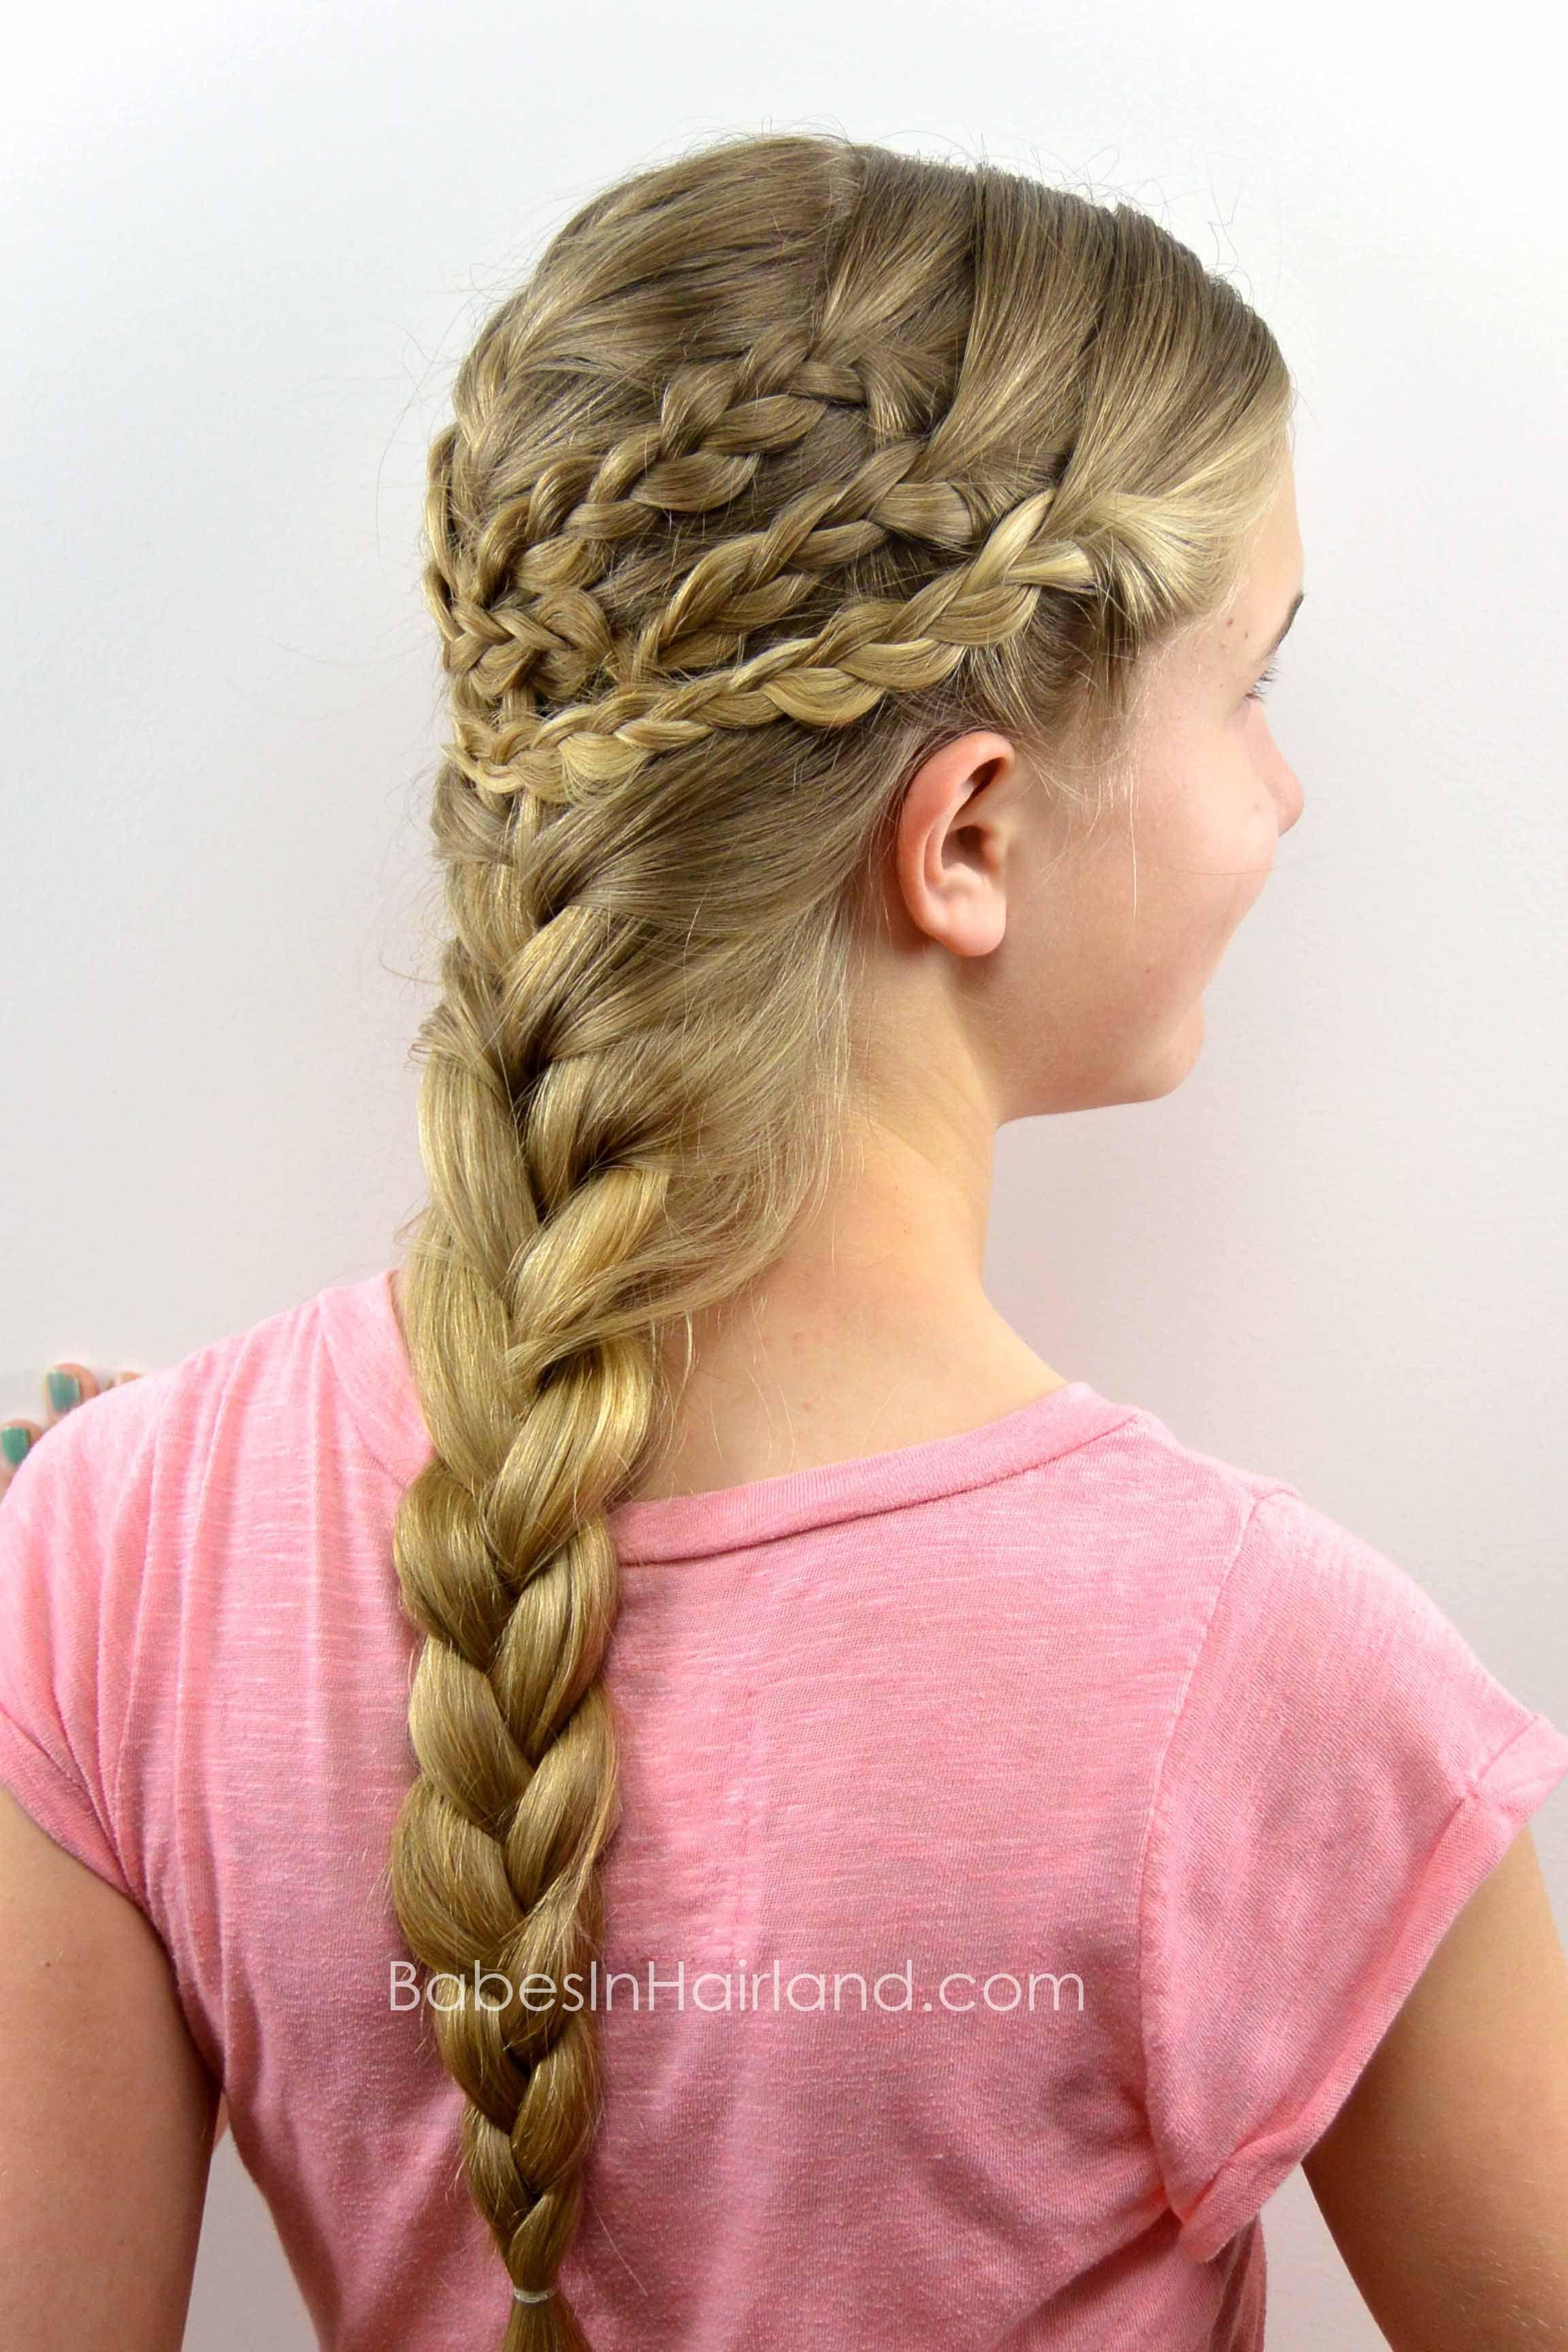 Triple braided boho style from babesinhairland boho braids